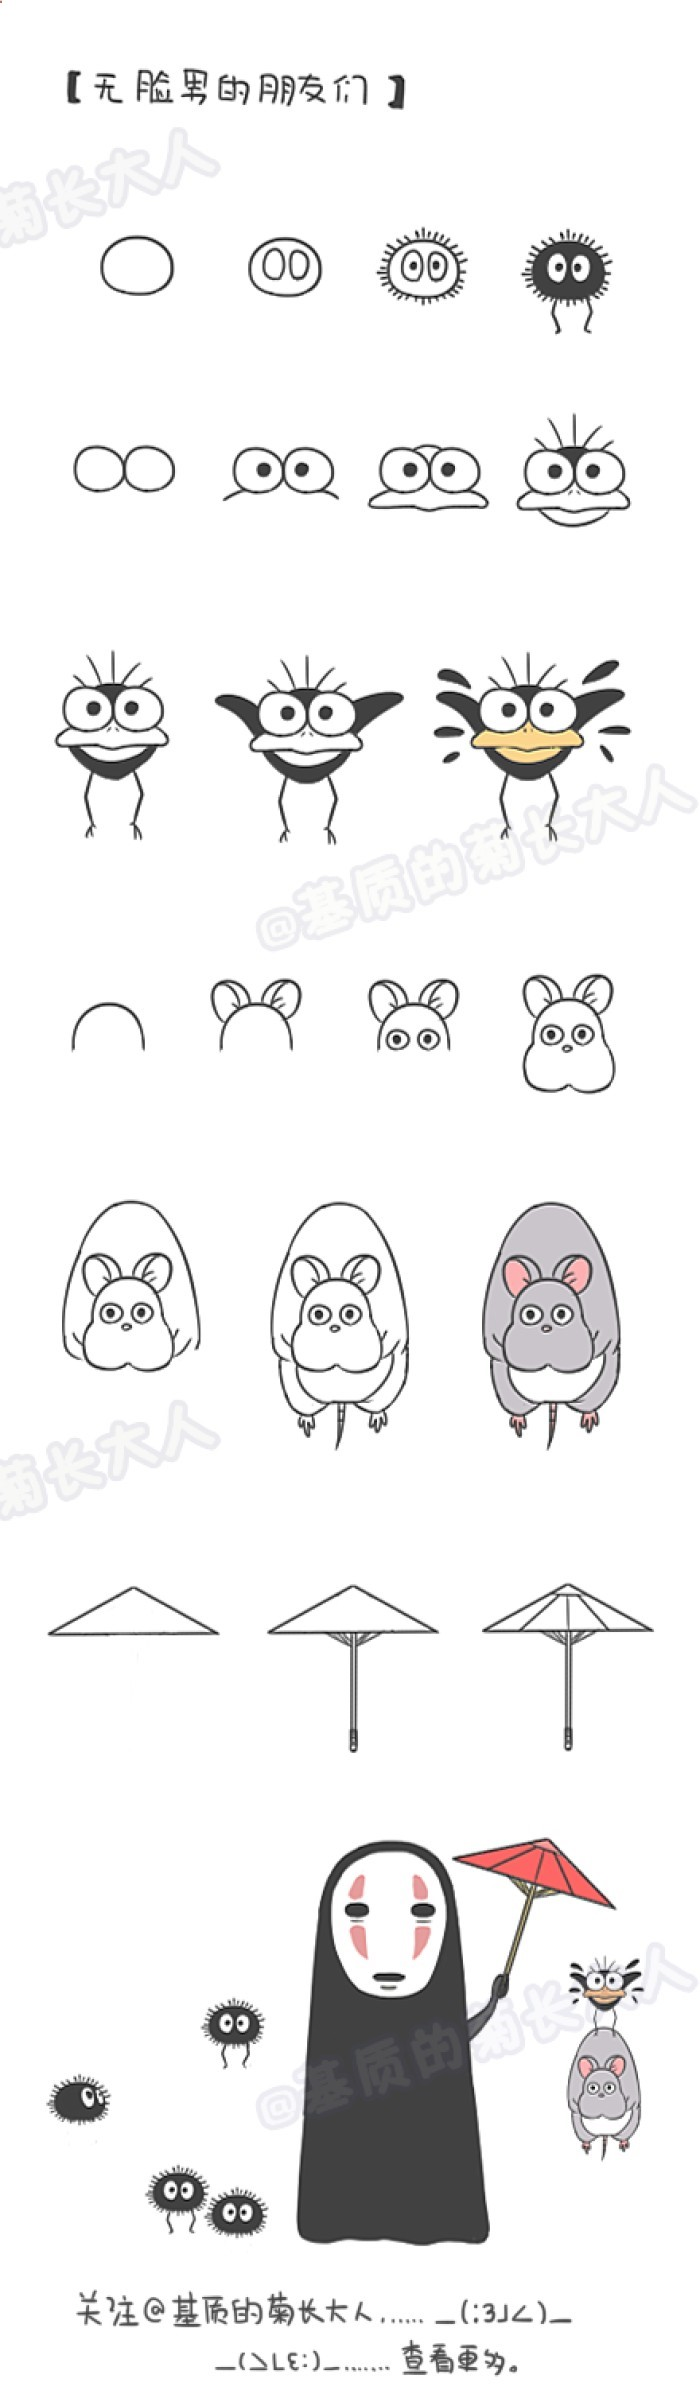 No Face Male Friends From The Base Of The Chrysanthemum Long Adults Studio Ghibli Art Ghibli Art Kawaii Drawings